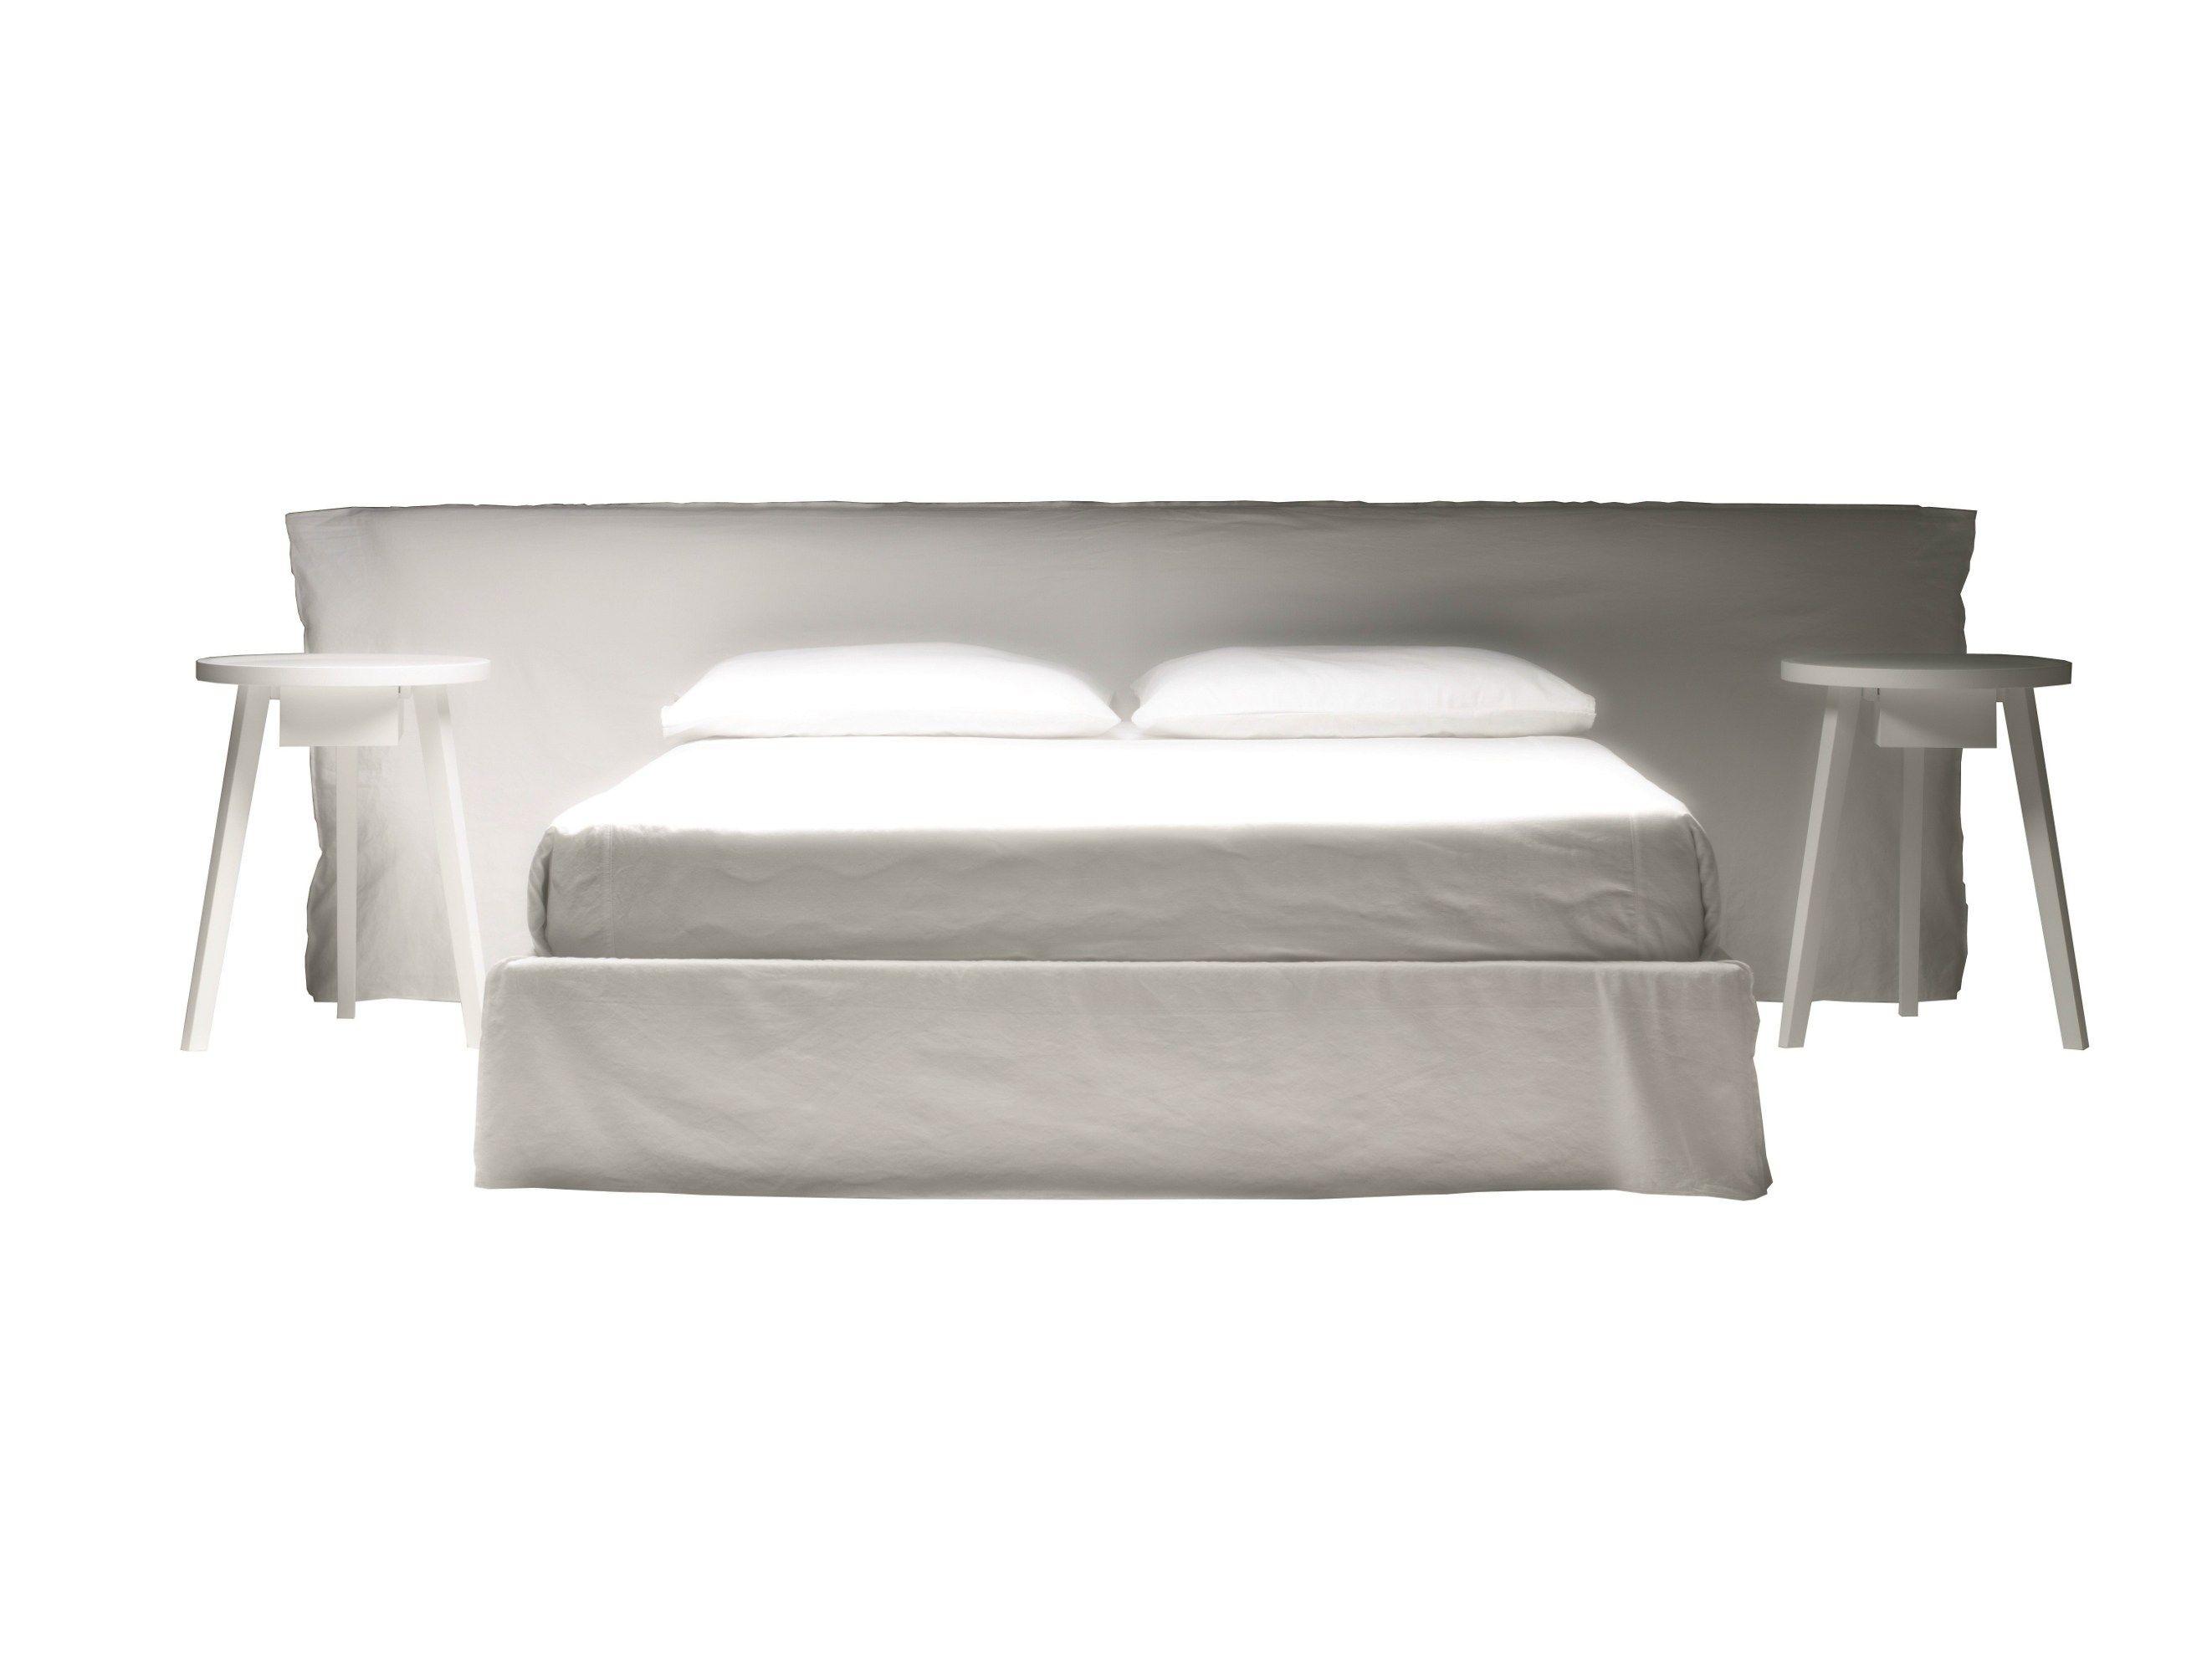 lit double avec rev tement amovible ghost 81 by gervasoni. Black Bedroom Furniture Sets. Home Design Ideas